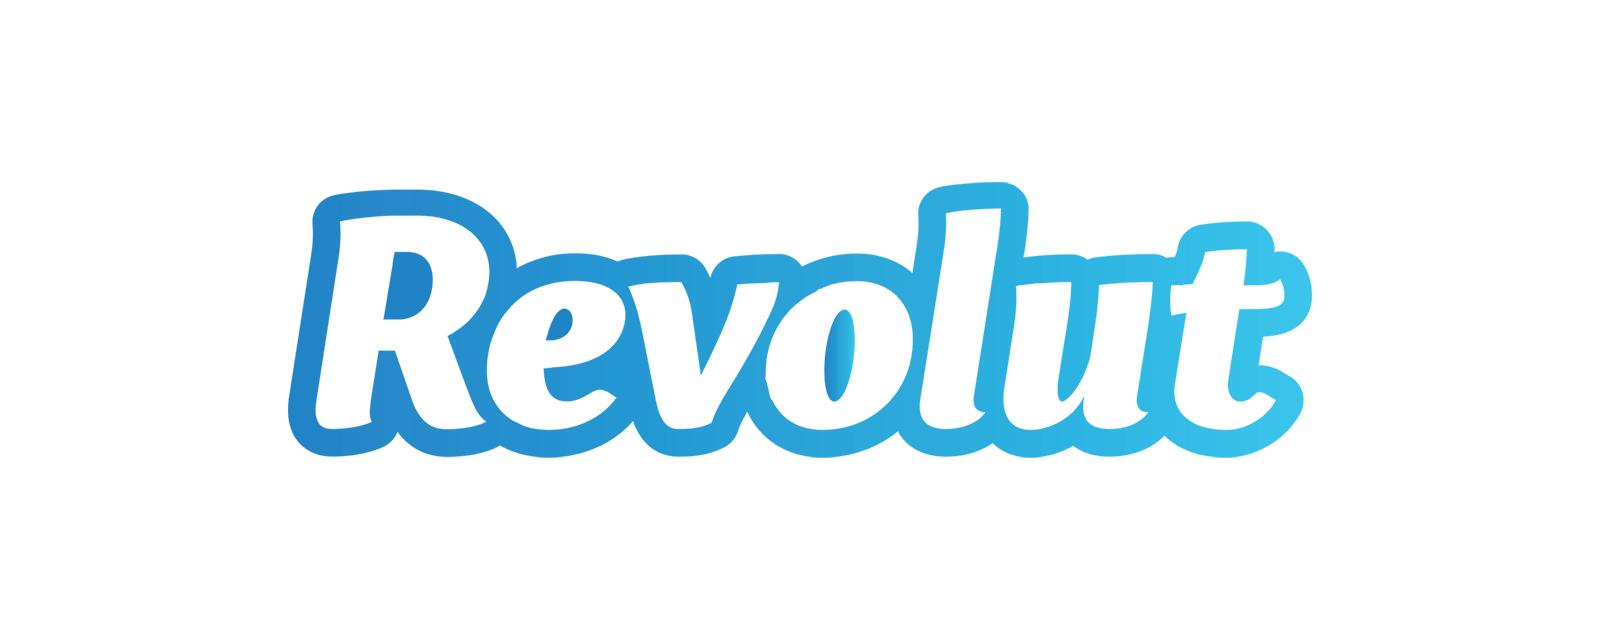 Zakupy Za Granica Taniej Z Karta Revolut Poradnik Rootblog